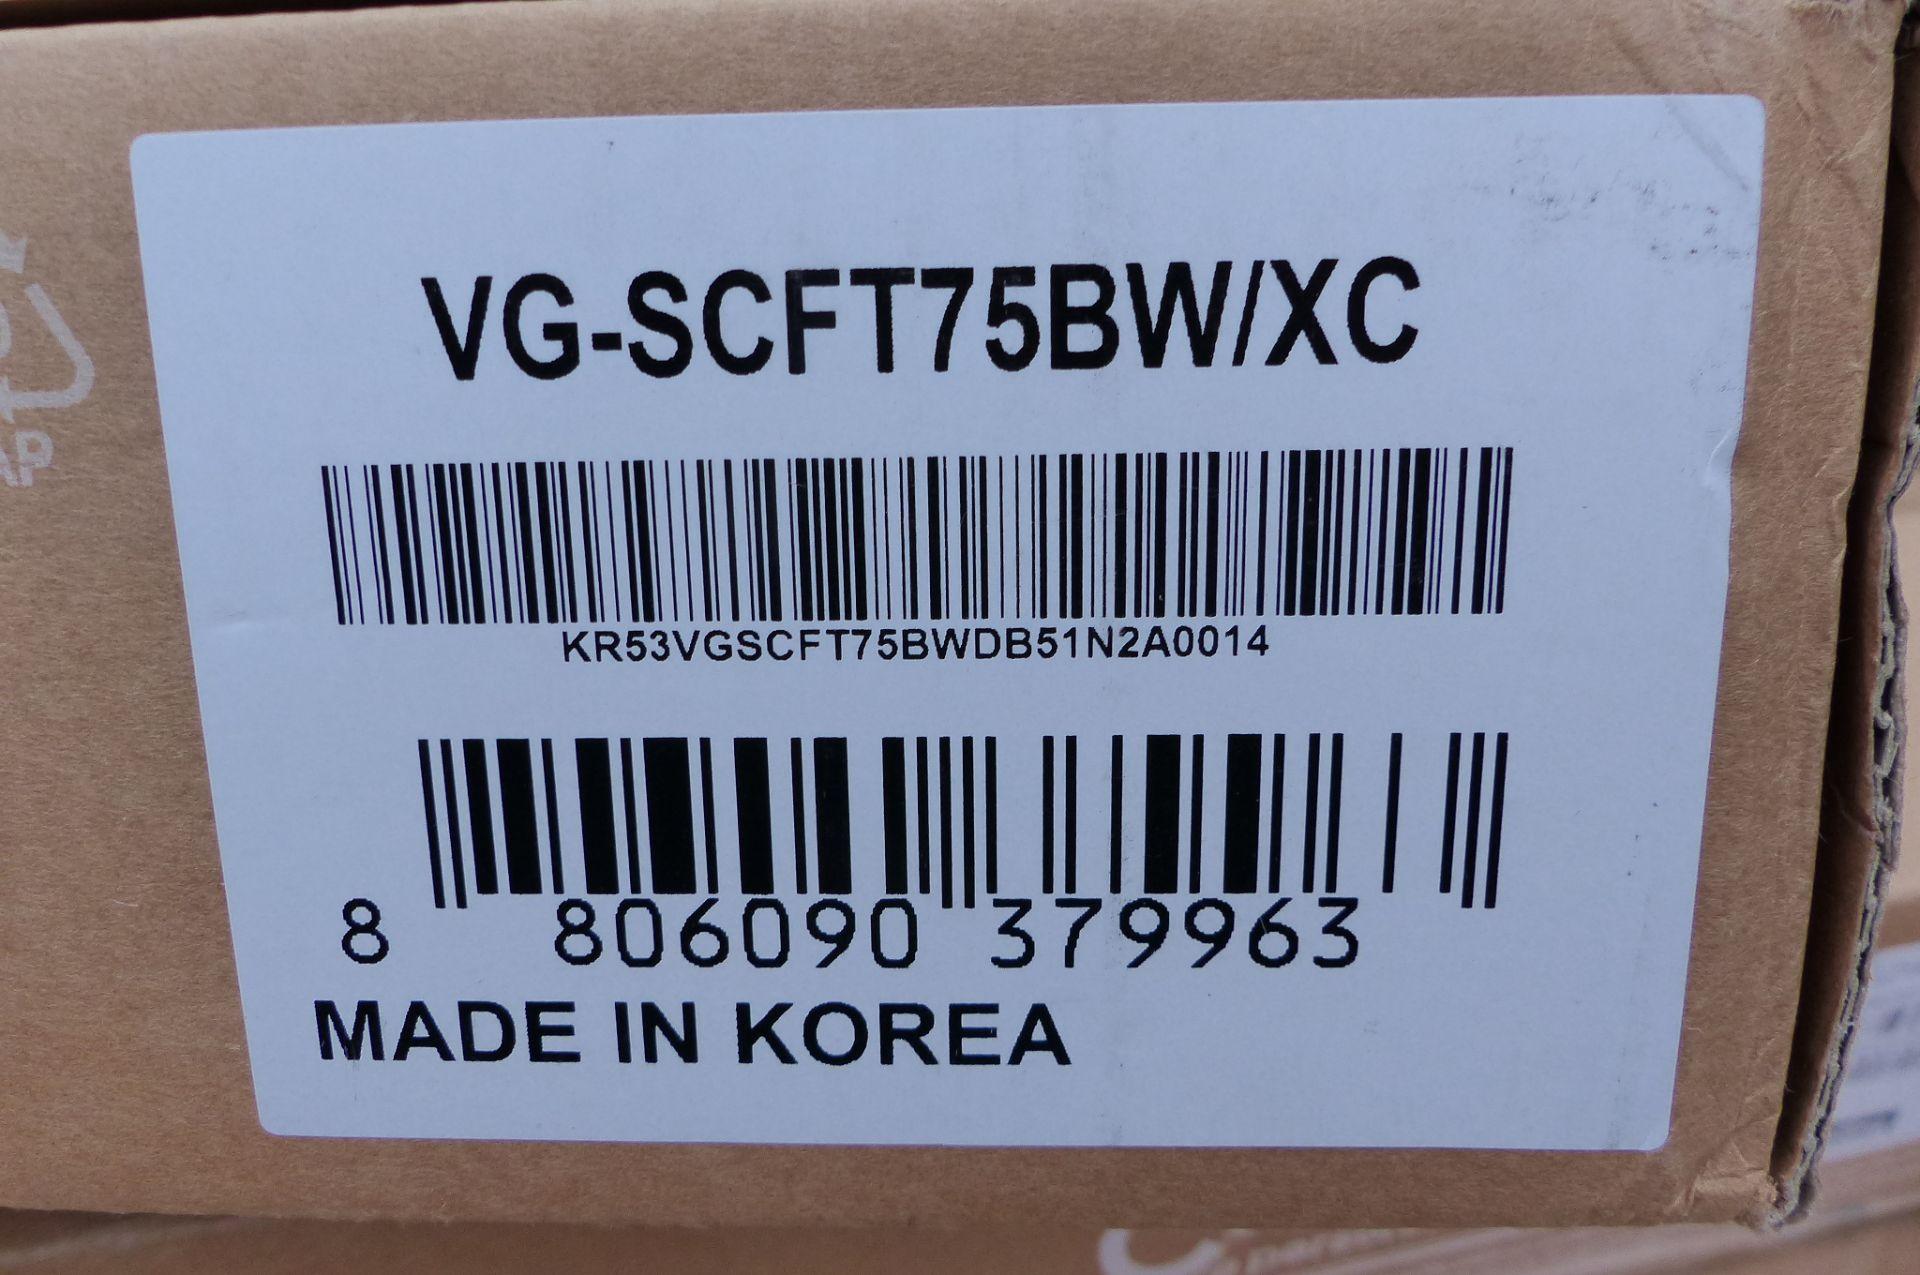 Samsung Customisable Bezel for The Frame TV - Image 2 of 2